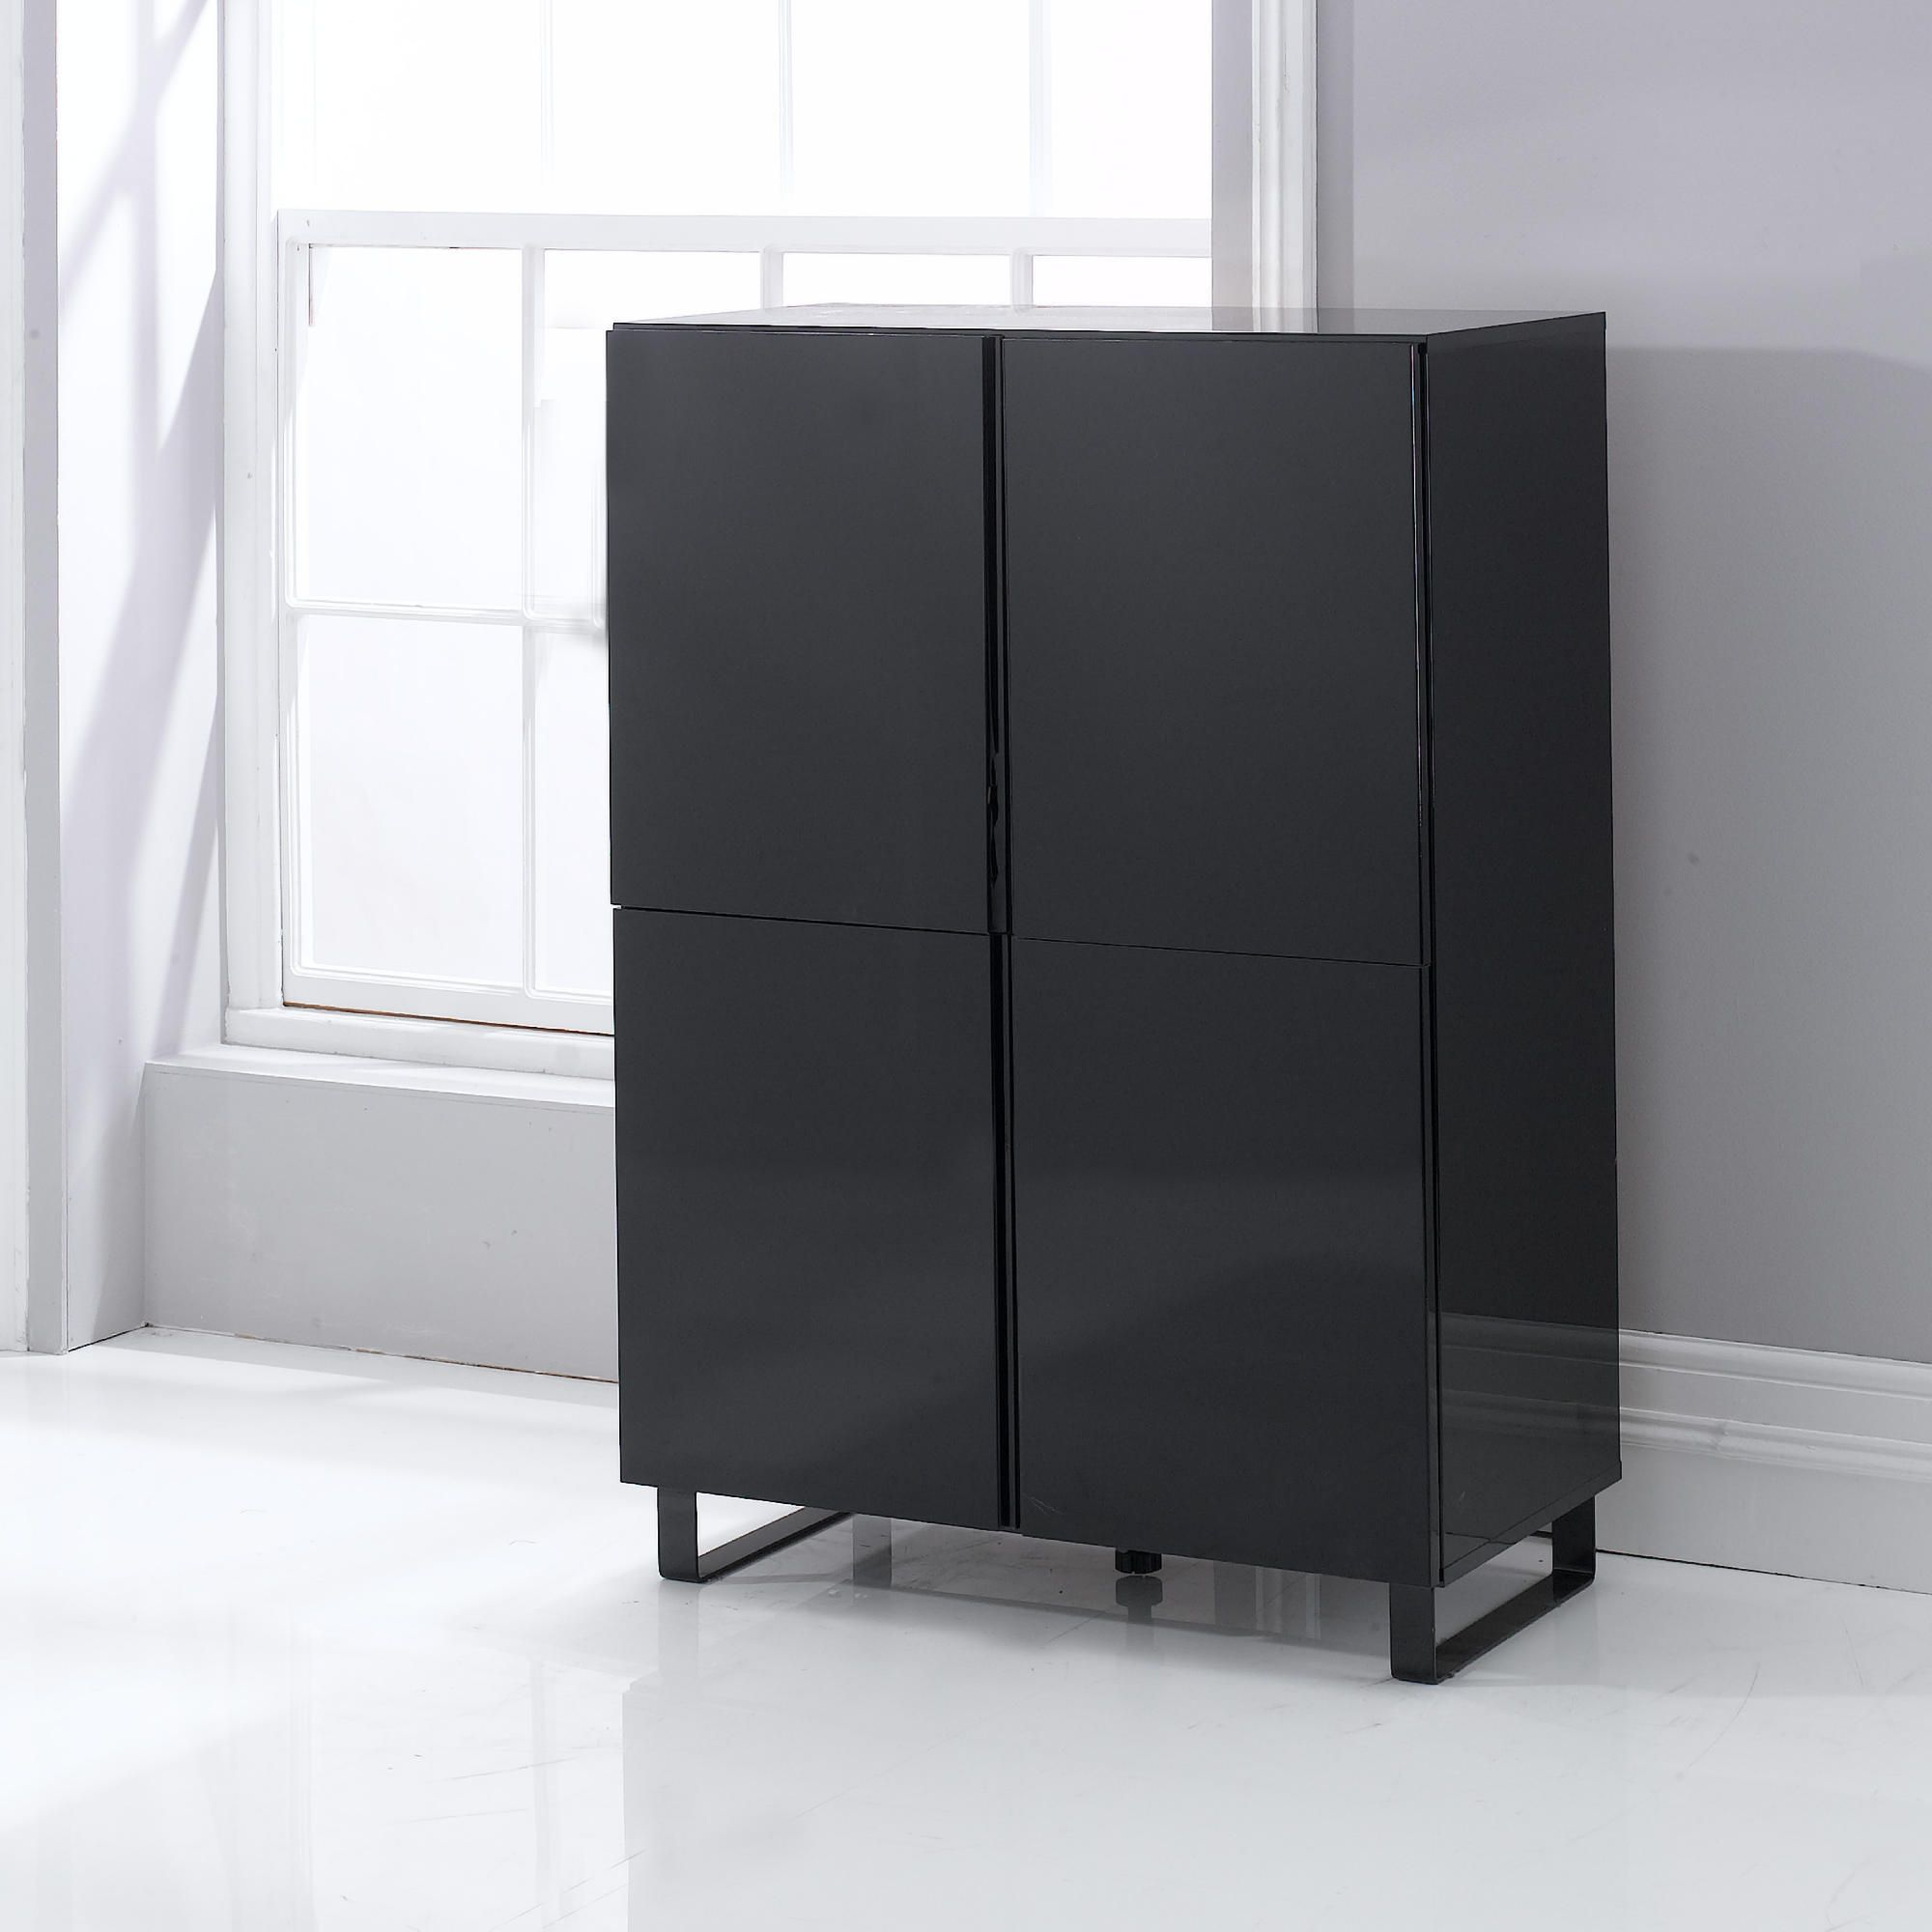 Urban 4 Door Storage Black at Tesco Direct